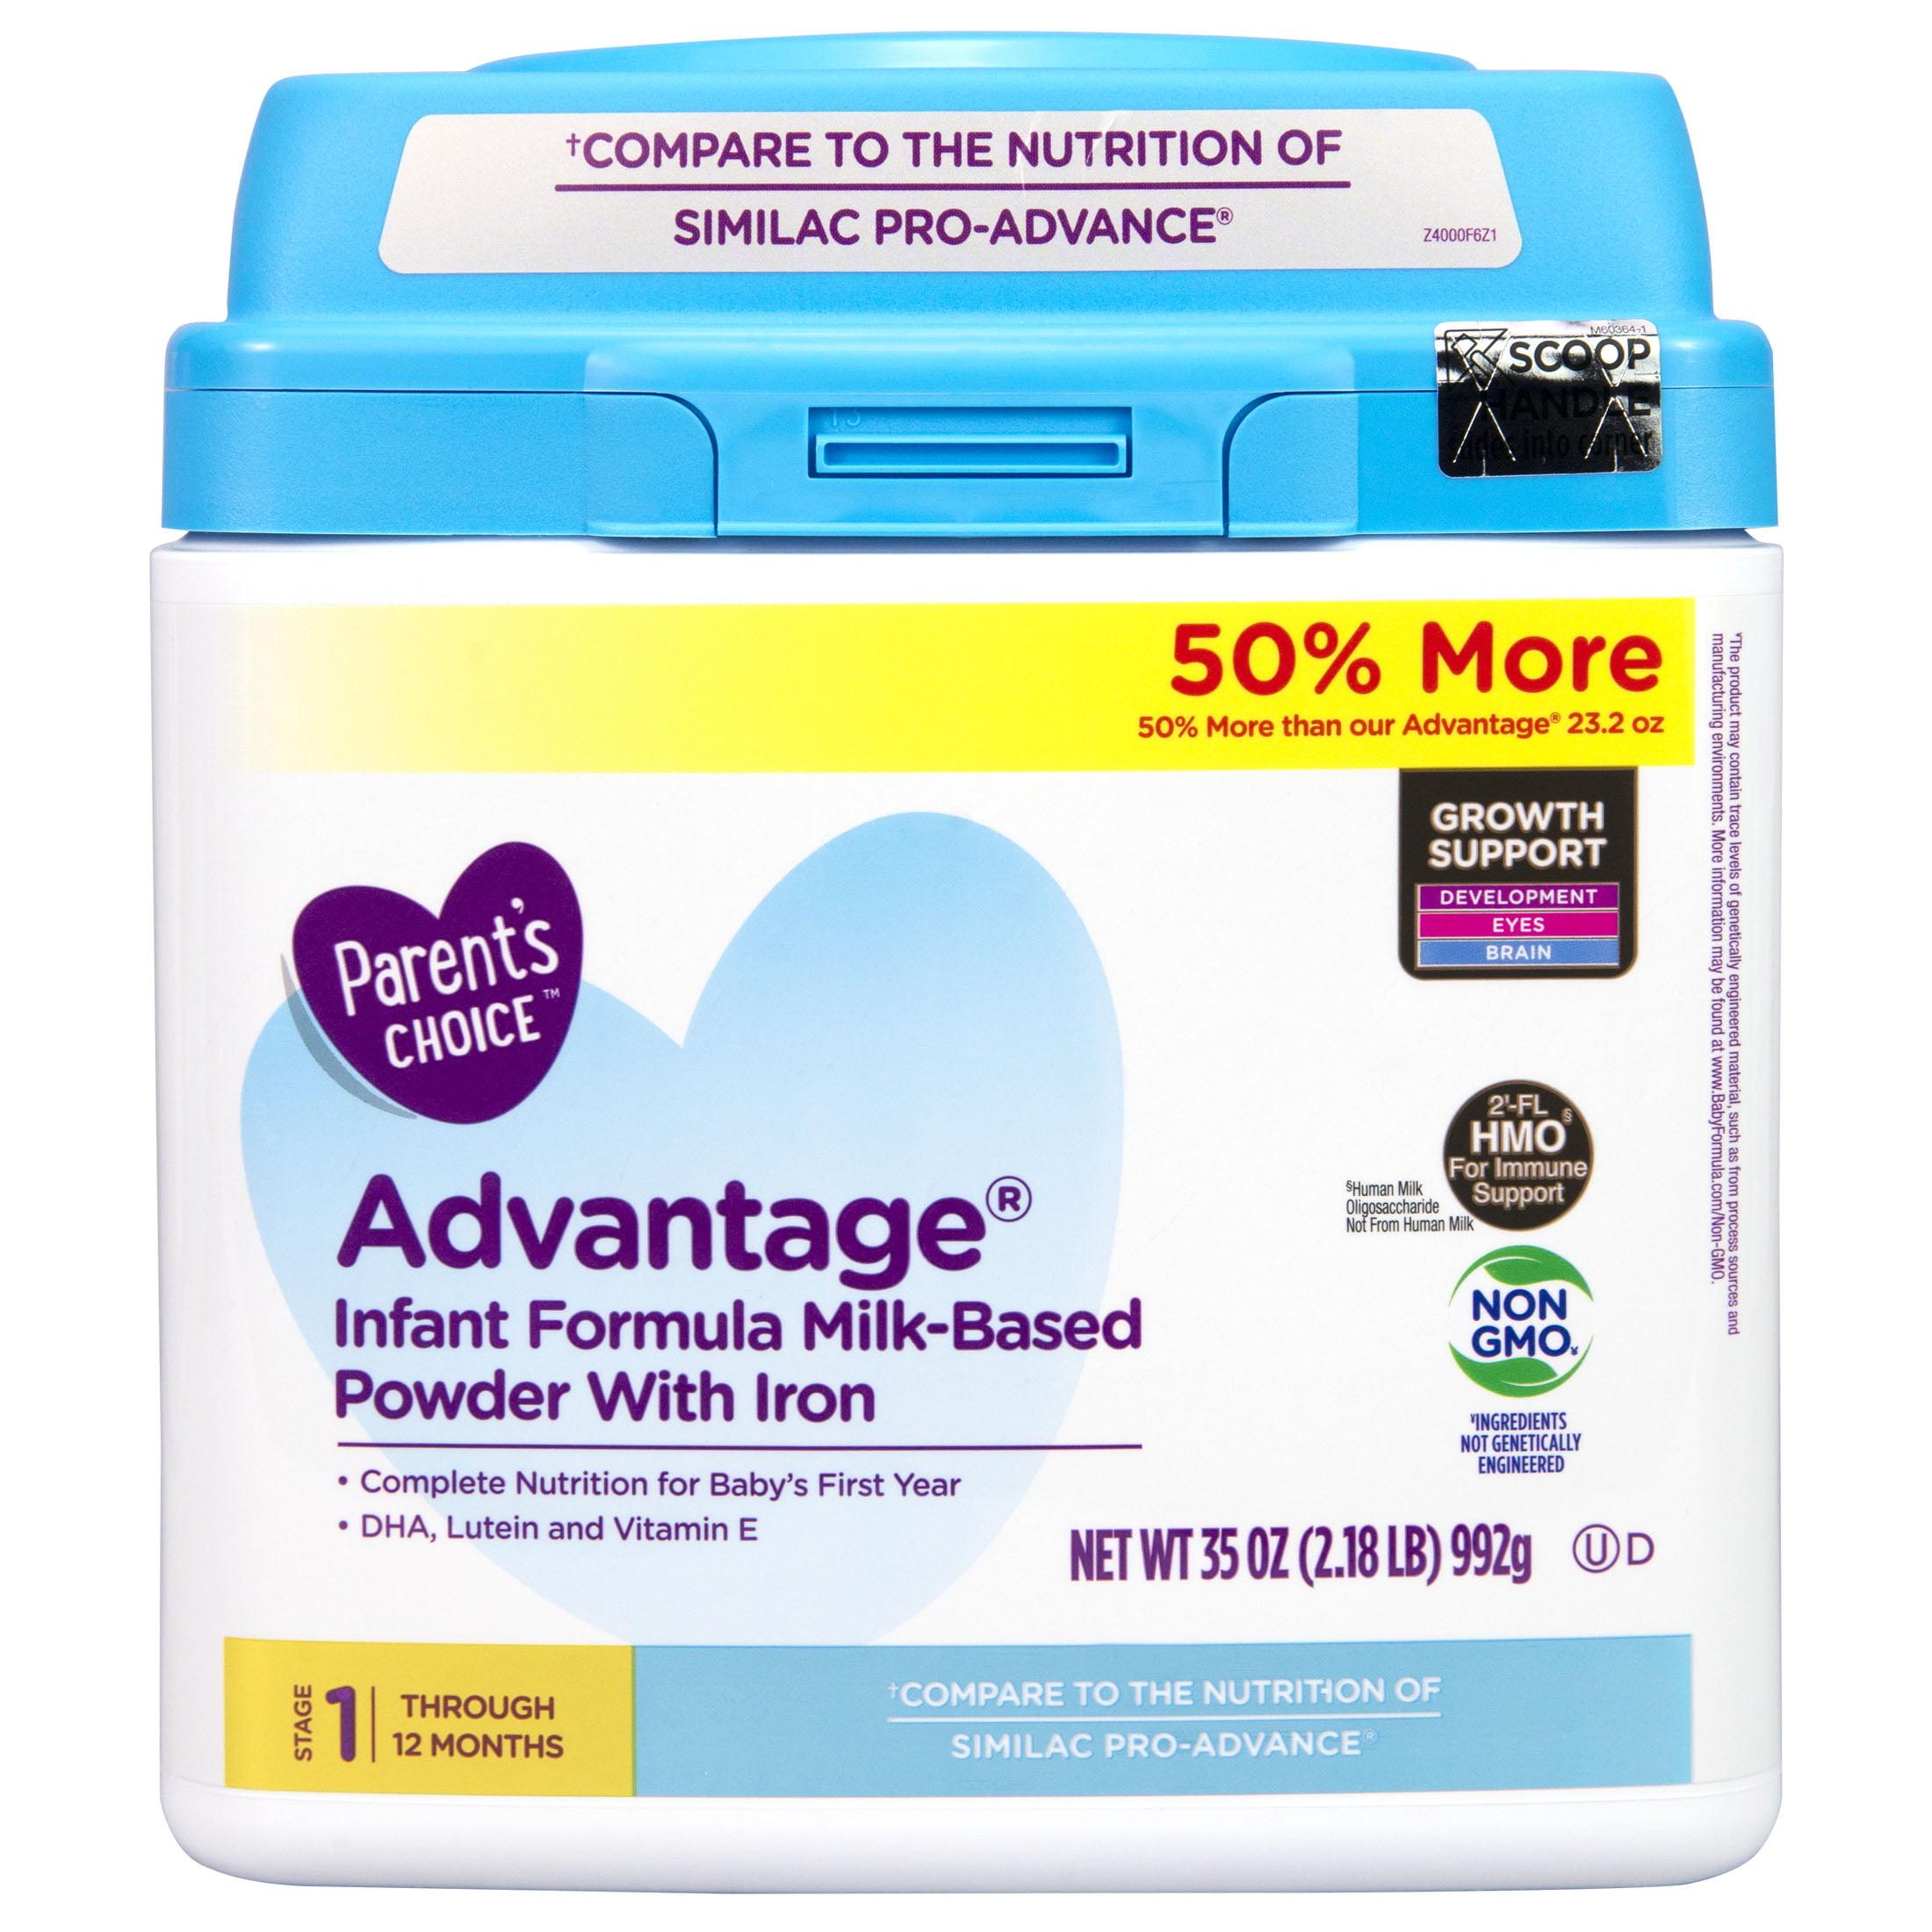 Parent's Choice HMO and Non-GMO Advantage Infant Formula, 35 oz